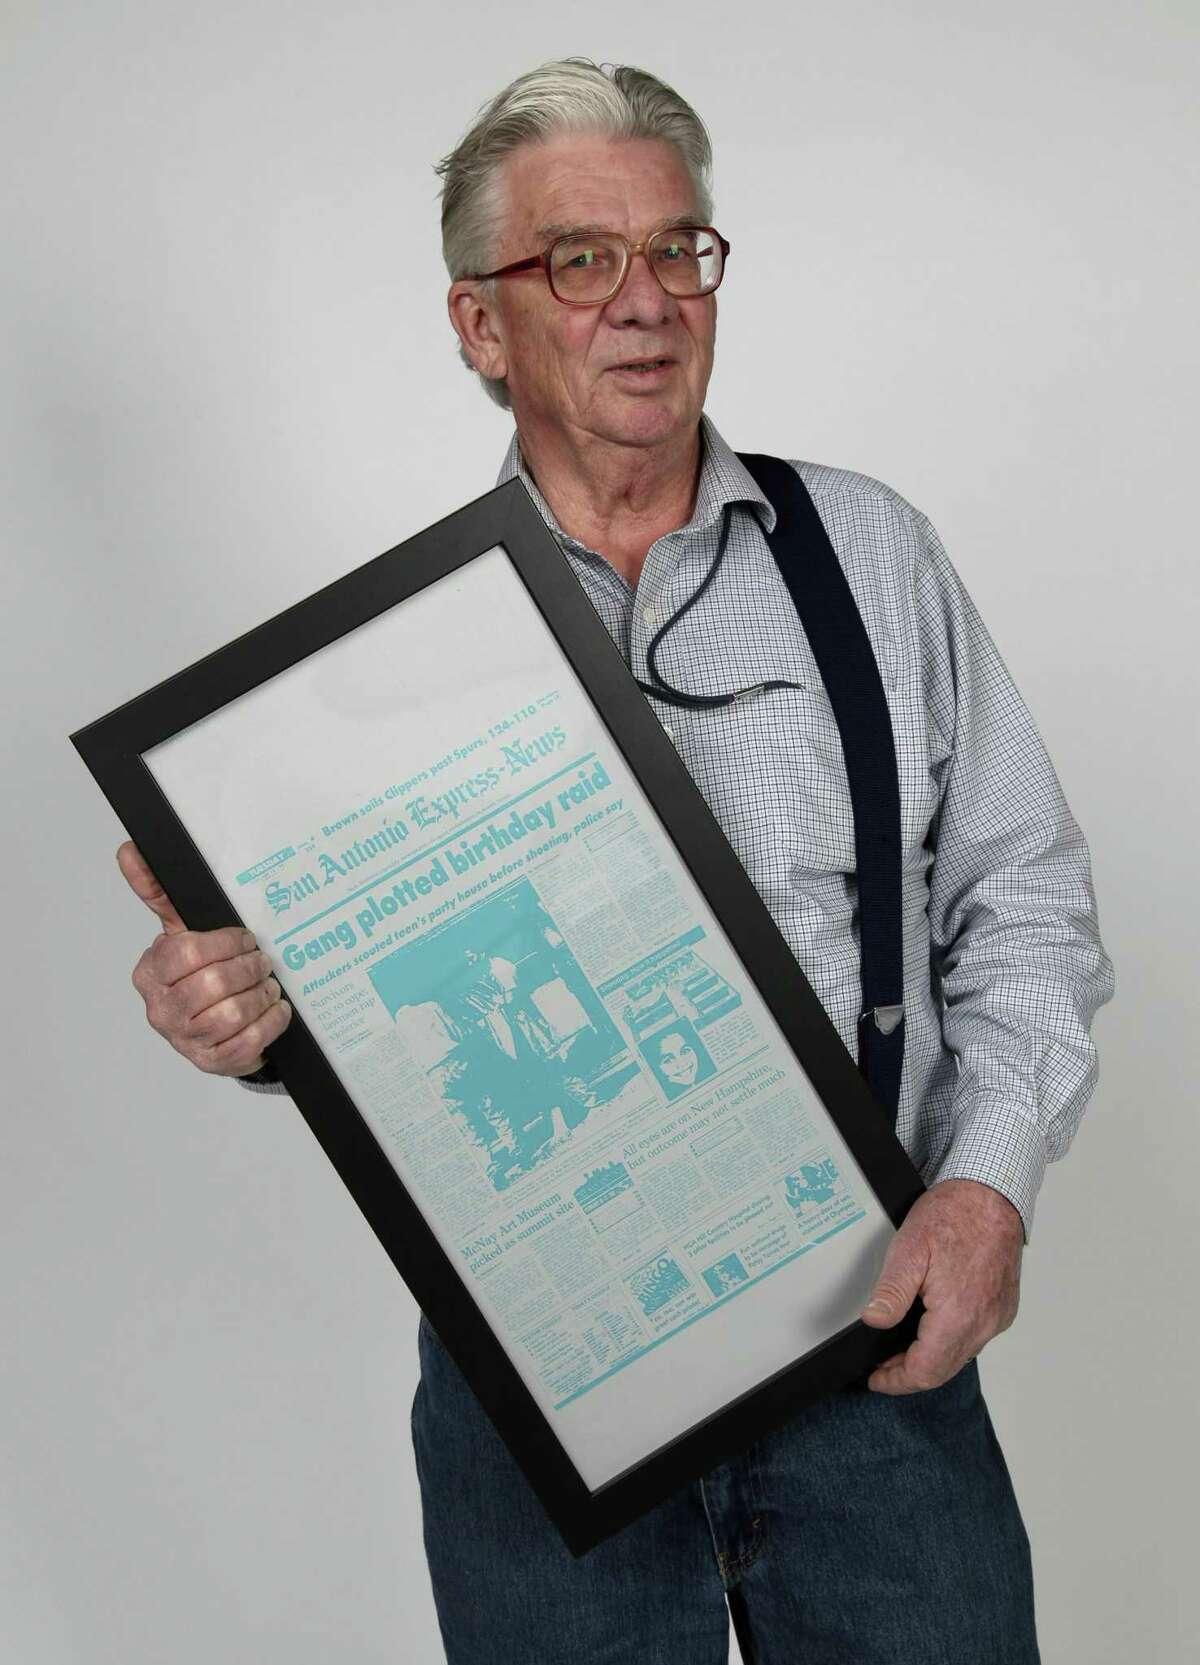 San Antonio Express-News Staff Writer John MacCormack in 2018, receiving a bit of newspaper memorabilia.